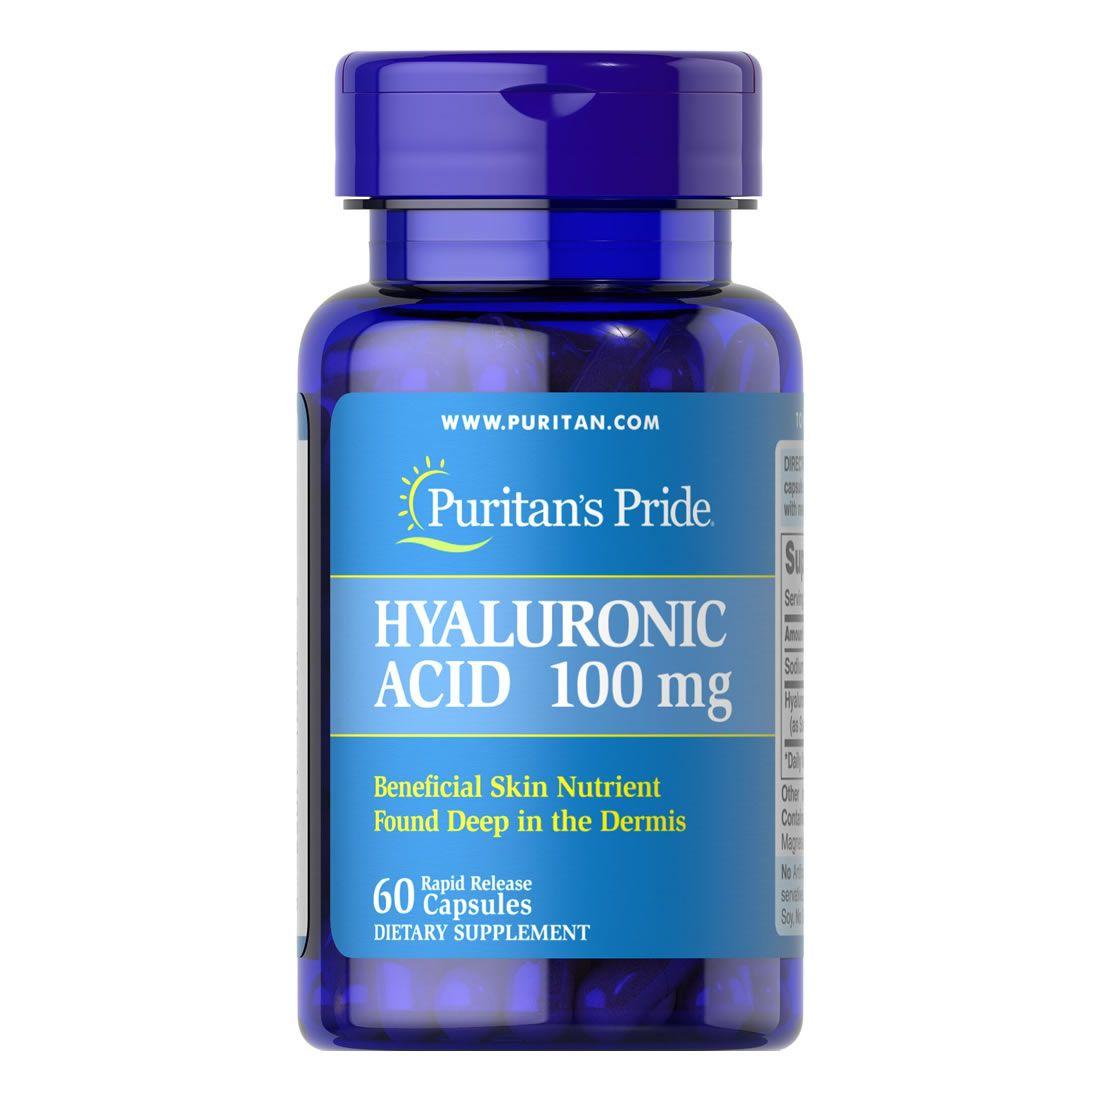 Ácido Hiarulônico 100mg Puritans Pride - 60 Cápsulas